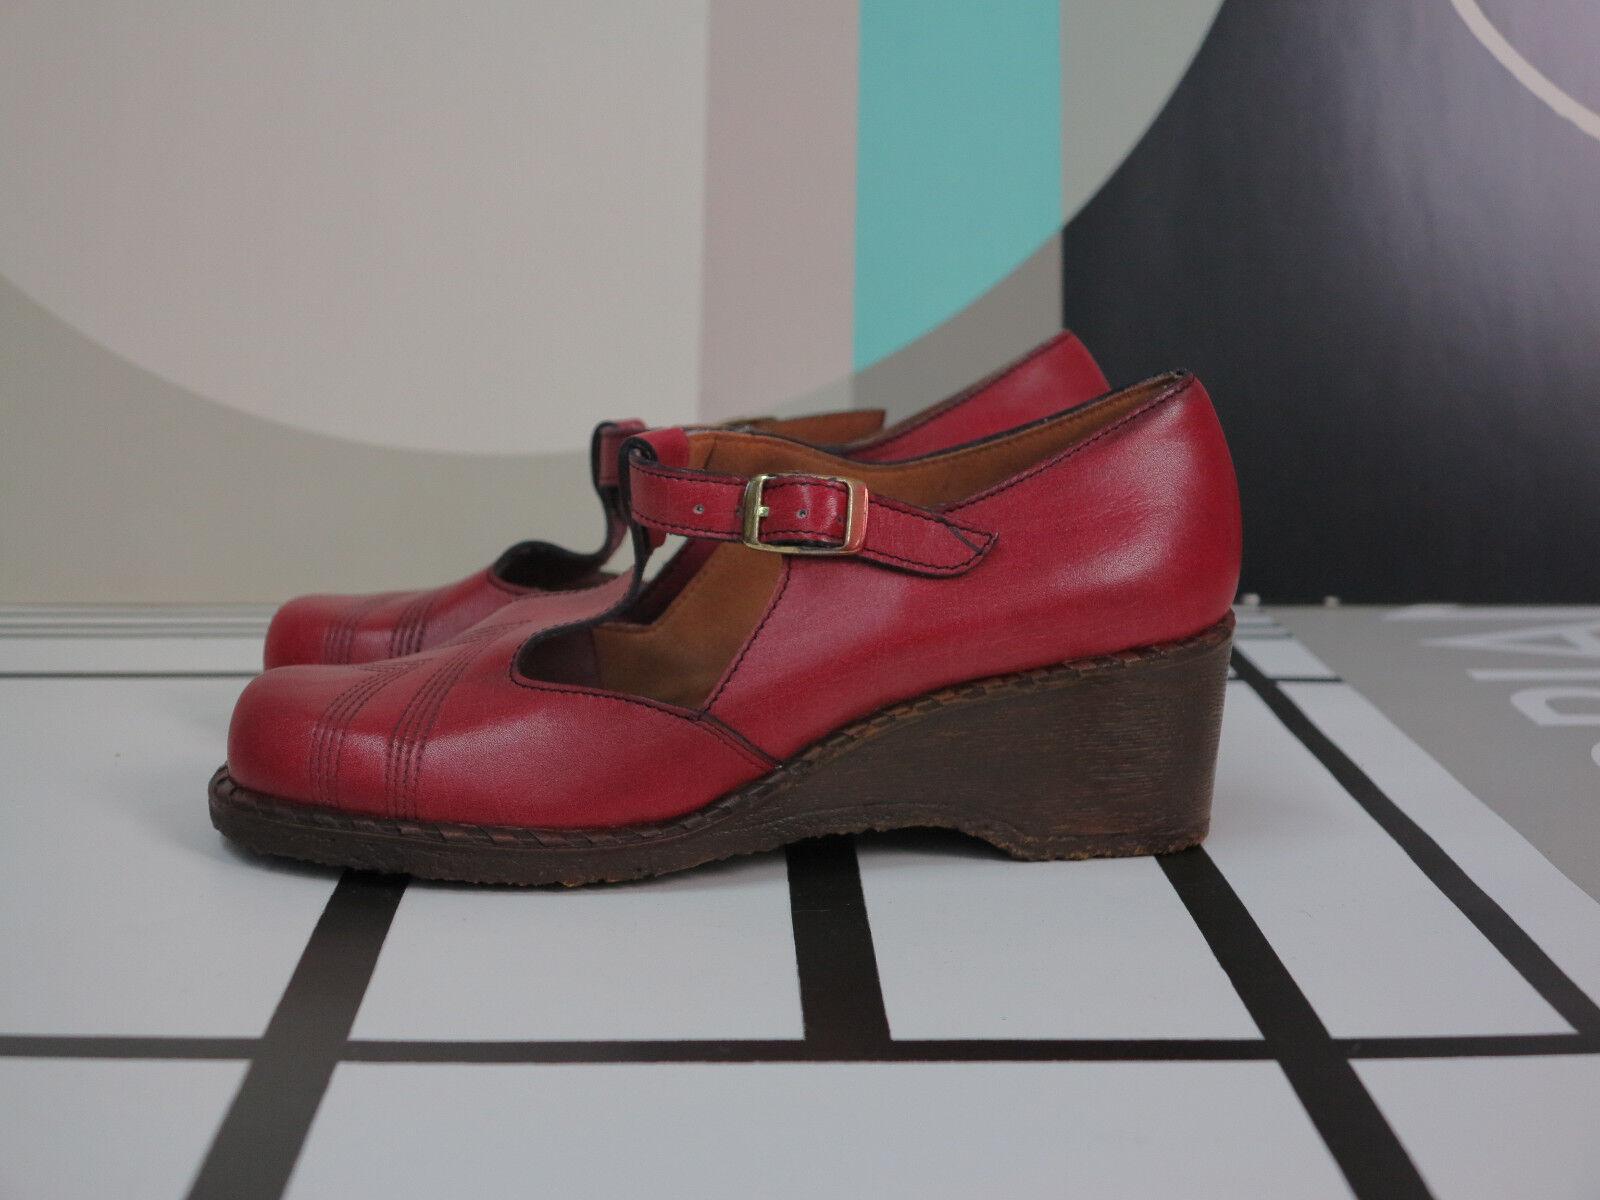 Mattil wedge damas plataforma zapatos zapato bajo 70er rojo truevintage 70s zapatos nos